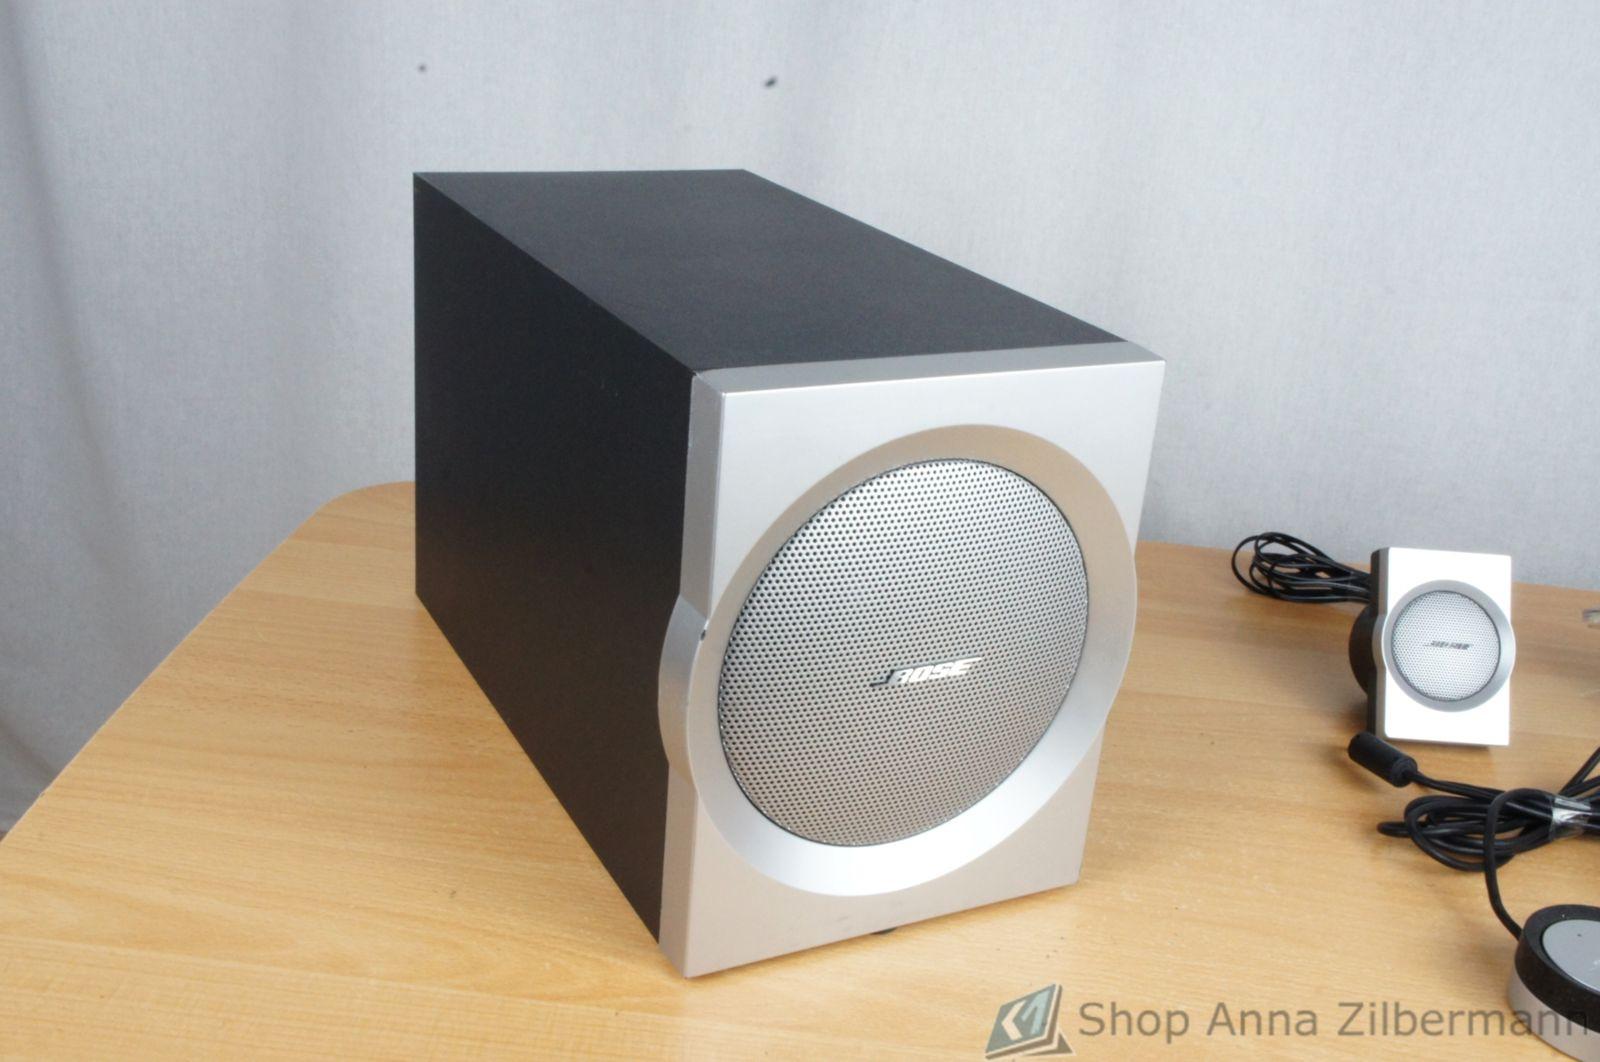 bose companion 3 multimedia lautsprecher system ebay. Black Bedroom Furniture Sets. Home Design Ideas